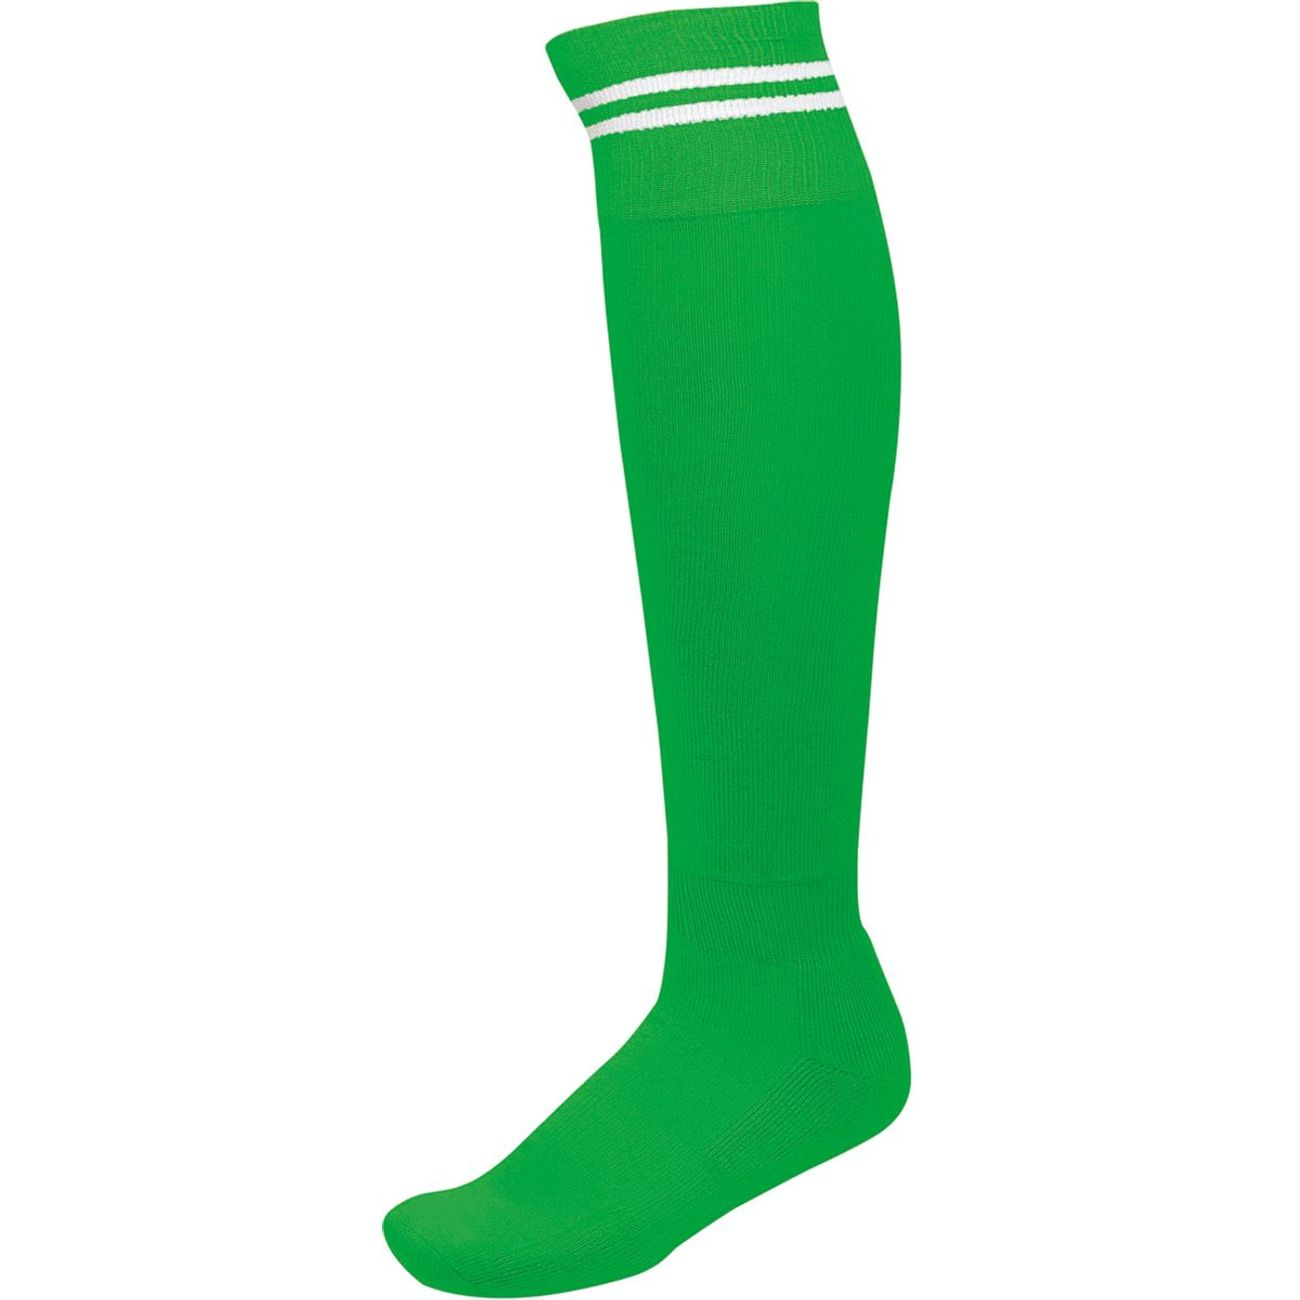 chaussettes sport pa015 vert kelly rayure blanche achat et prix pas cher go sport. Black Bedroom Furniture Sets. Home Design Ideas